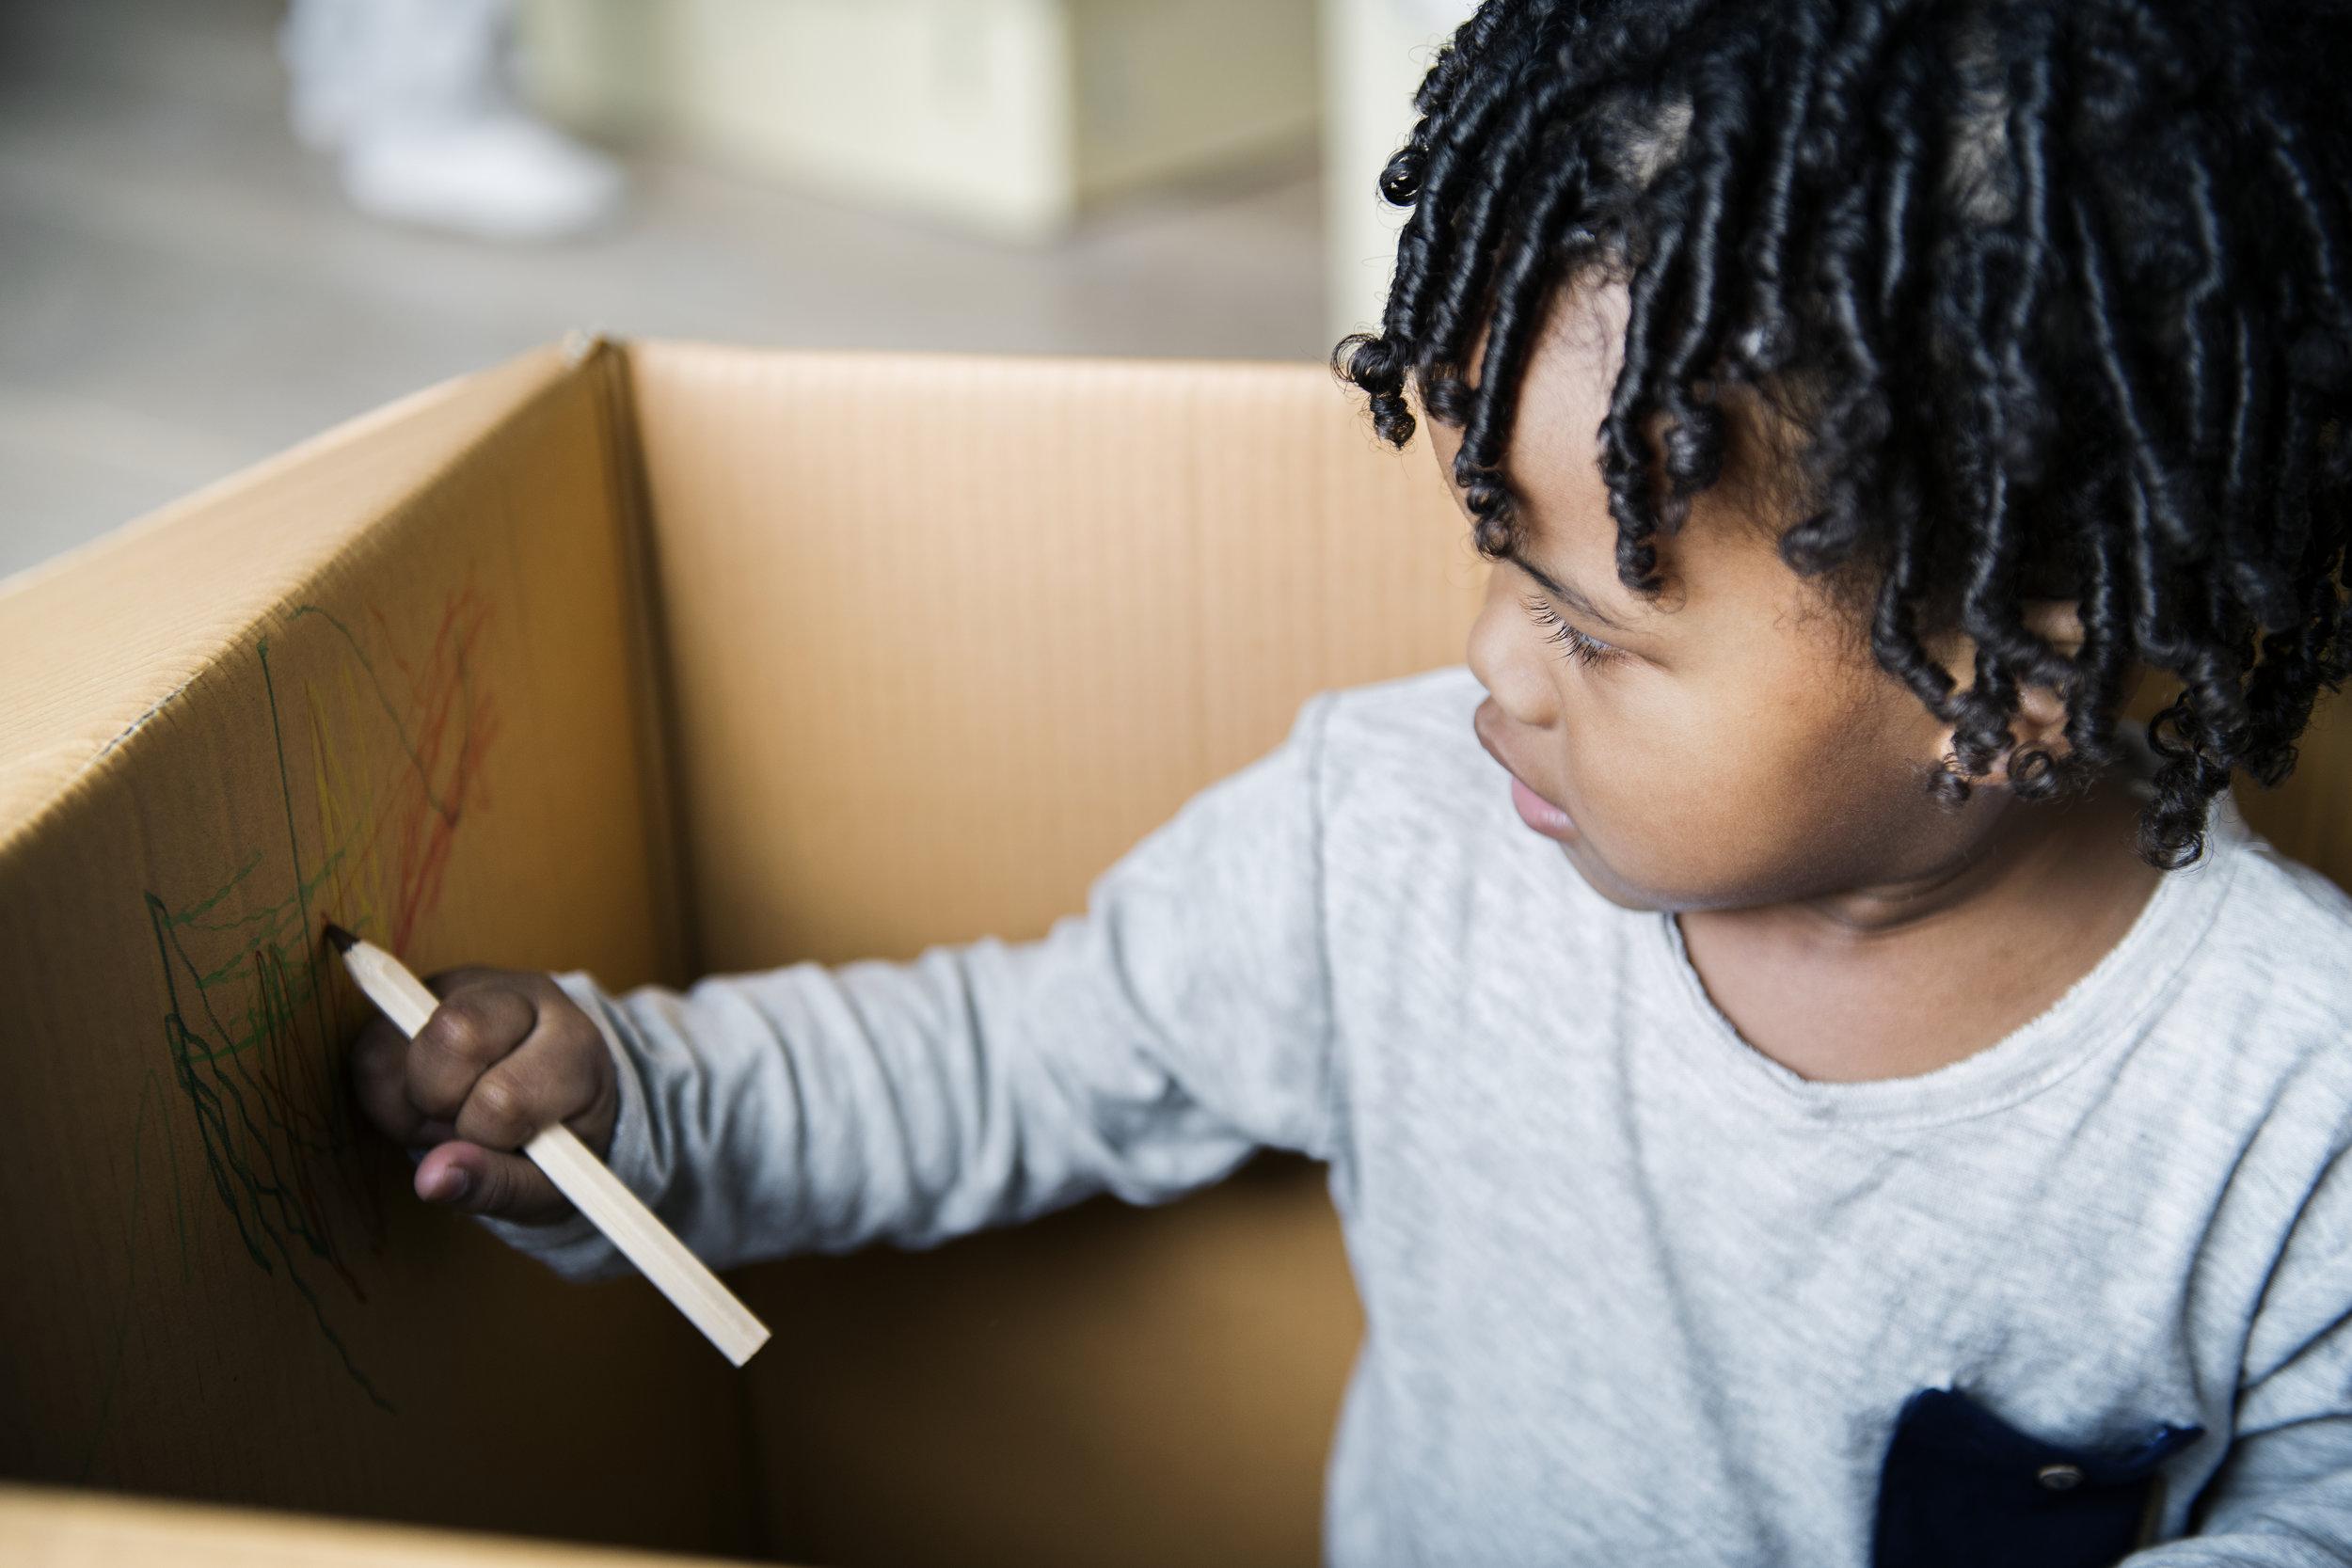 young-black-boy-drawing-in-a-box-P5XKD6S.jpg